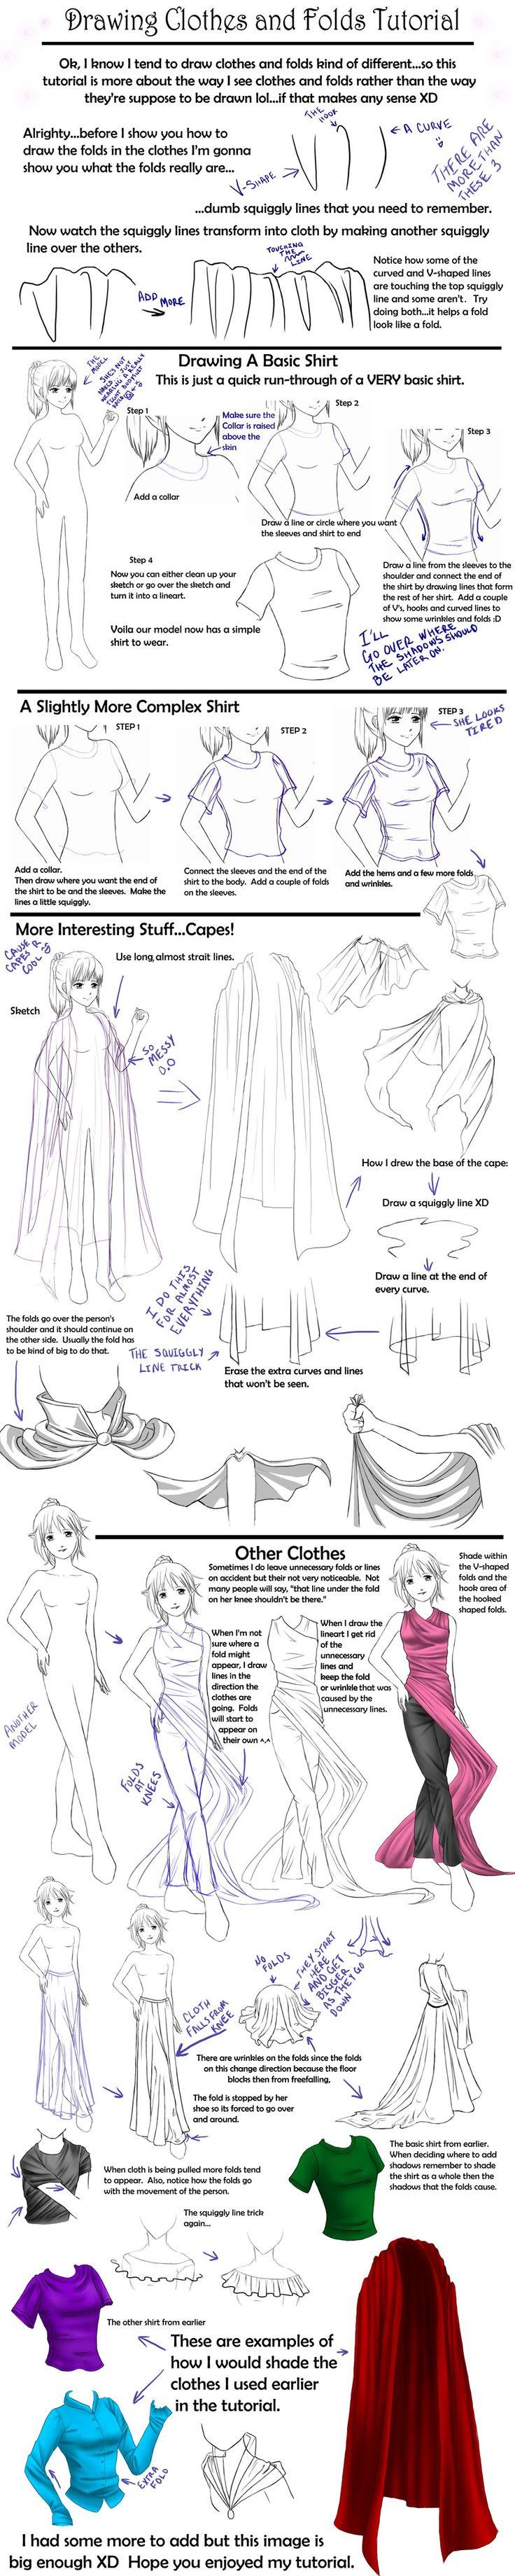 como dibujar anime manga!!! (ropa pliegues arrugas etc)